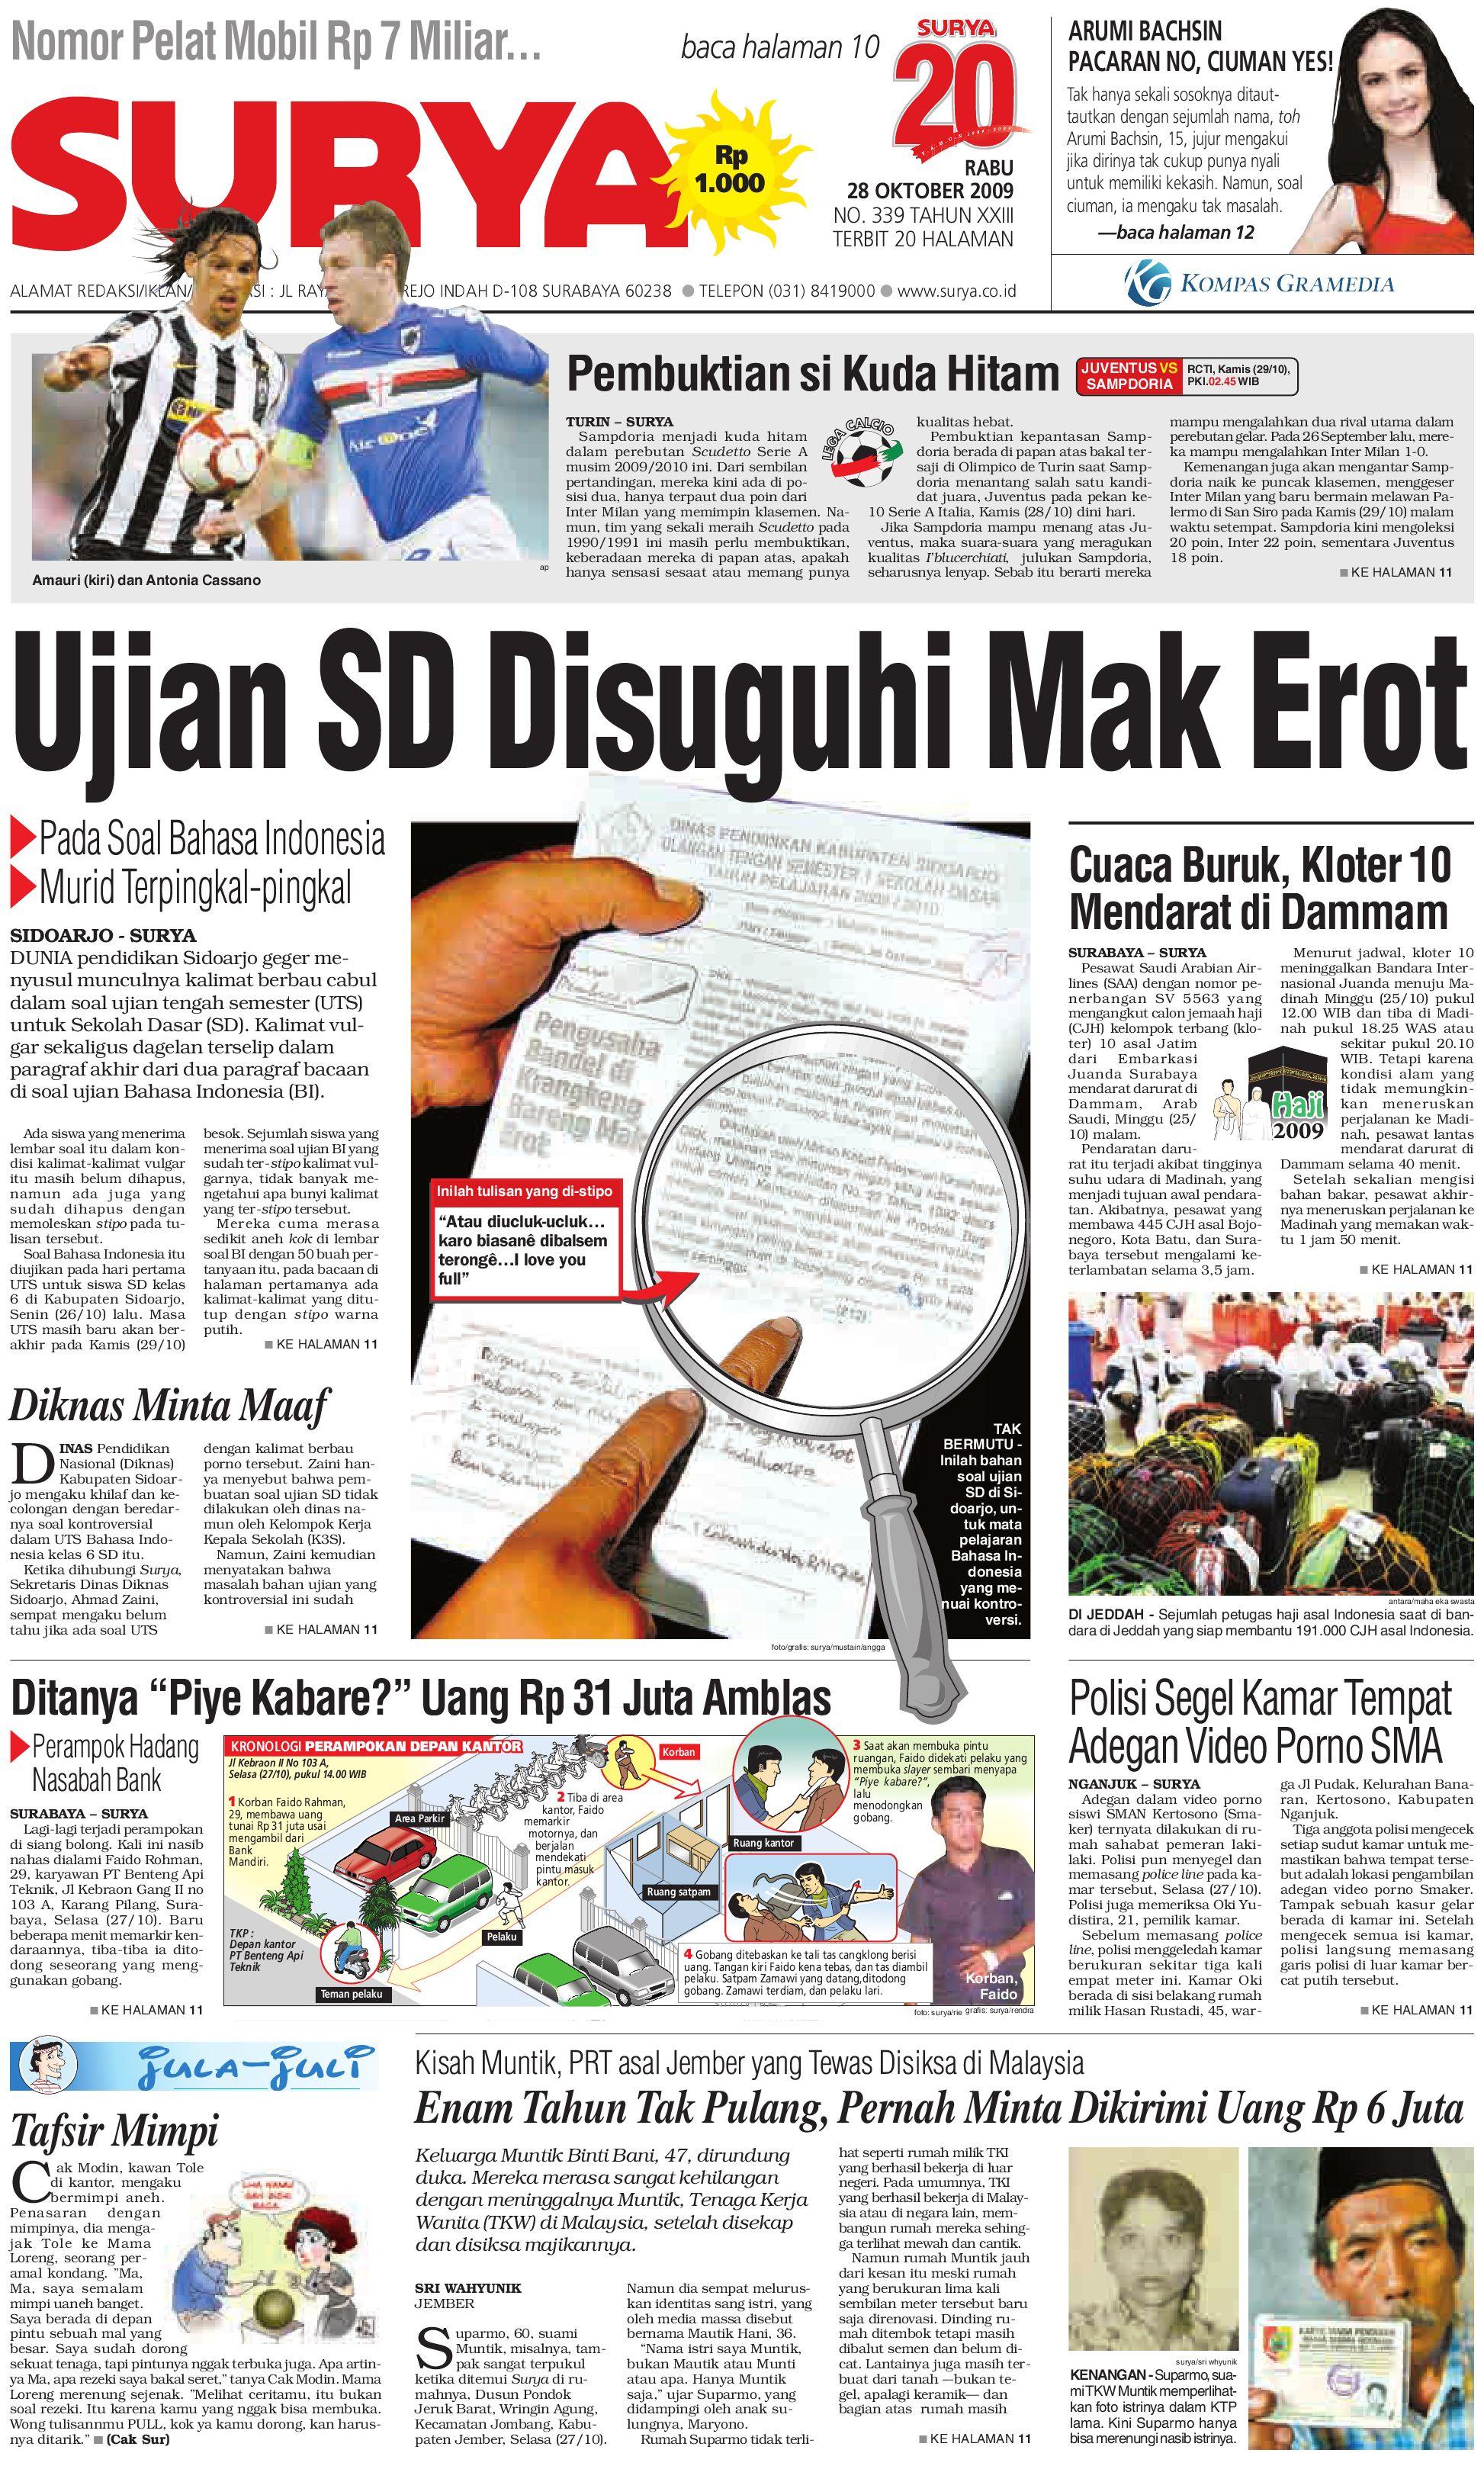 Surya Edisi Cetak 28 Okt 2009 By Harian Issuu Produk Ukm Bumn Kain Batik Eksklusif Lasem Manuk